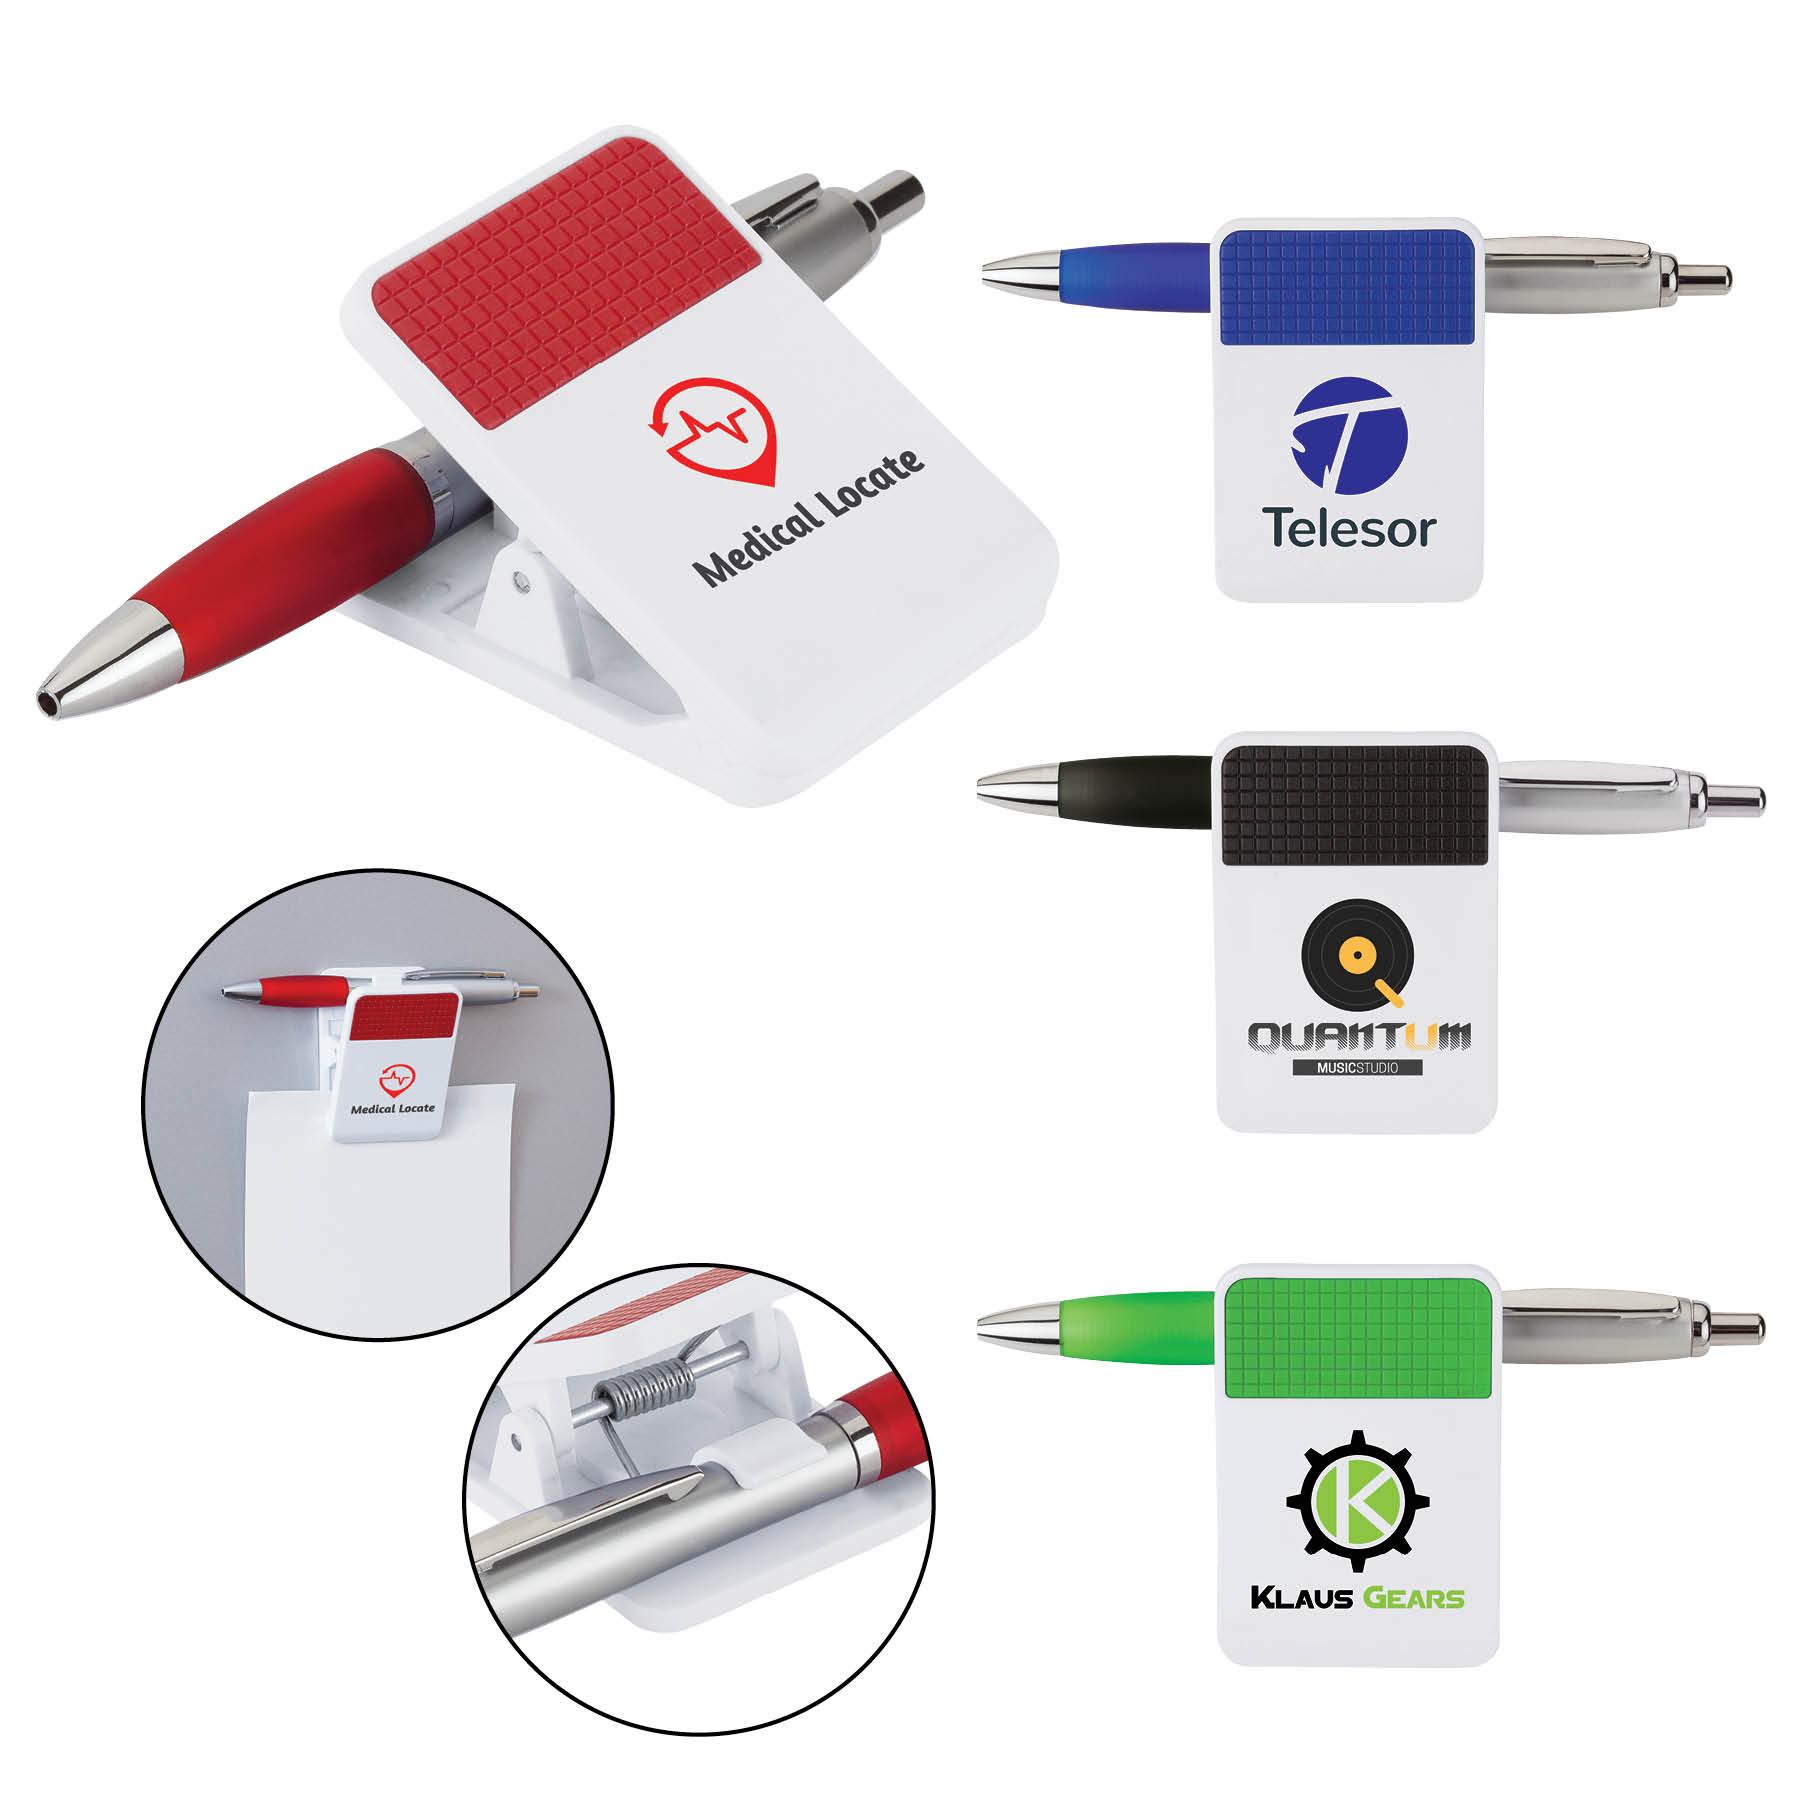 Clipa II Fridge Memo / Chip Clip / Ballpoint Pen